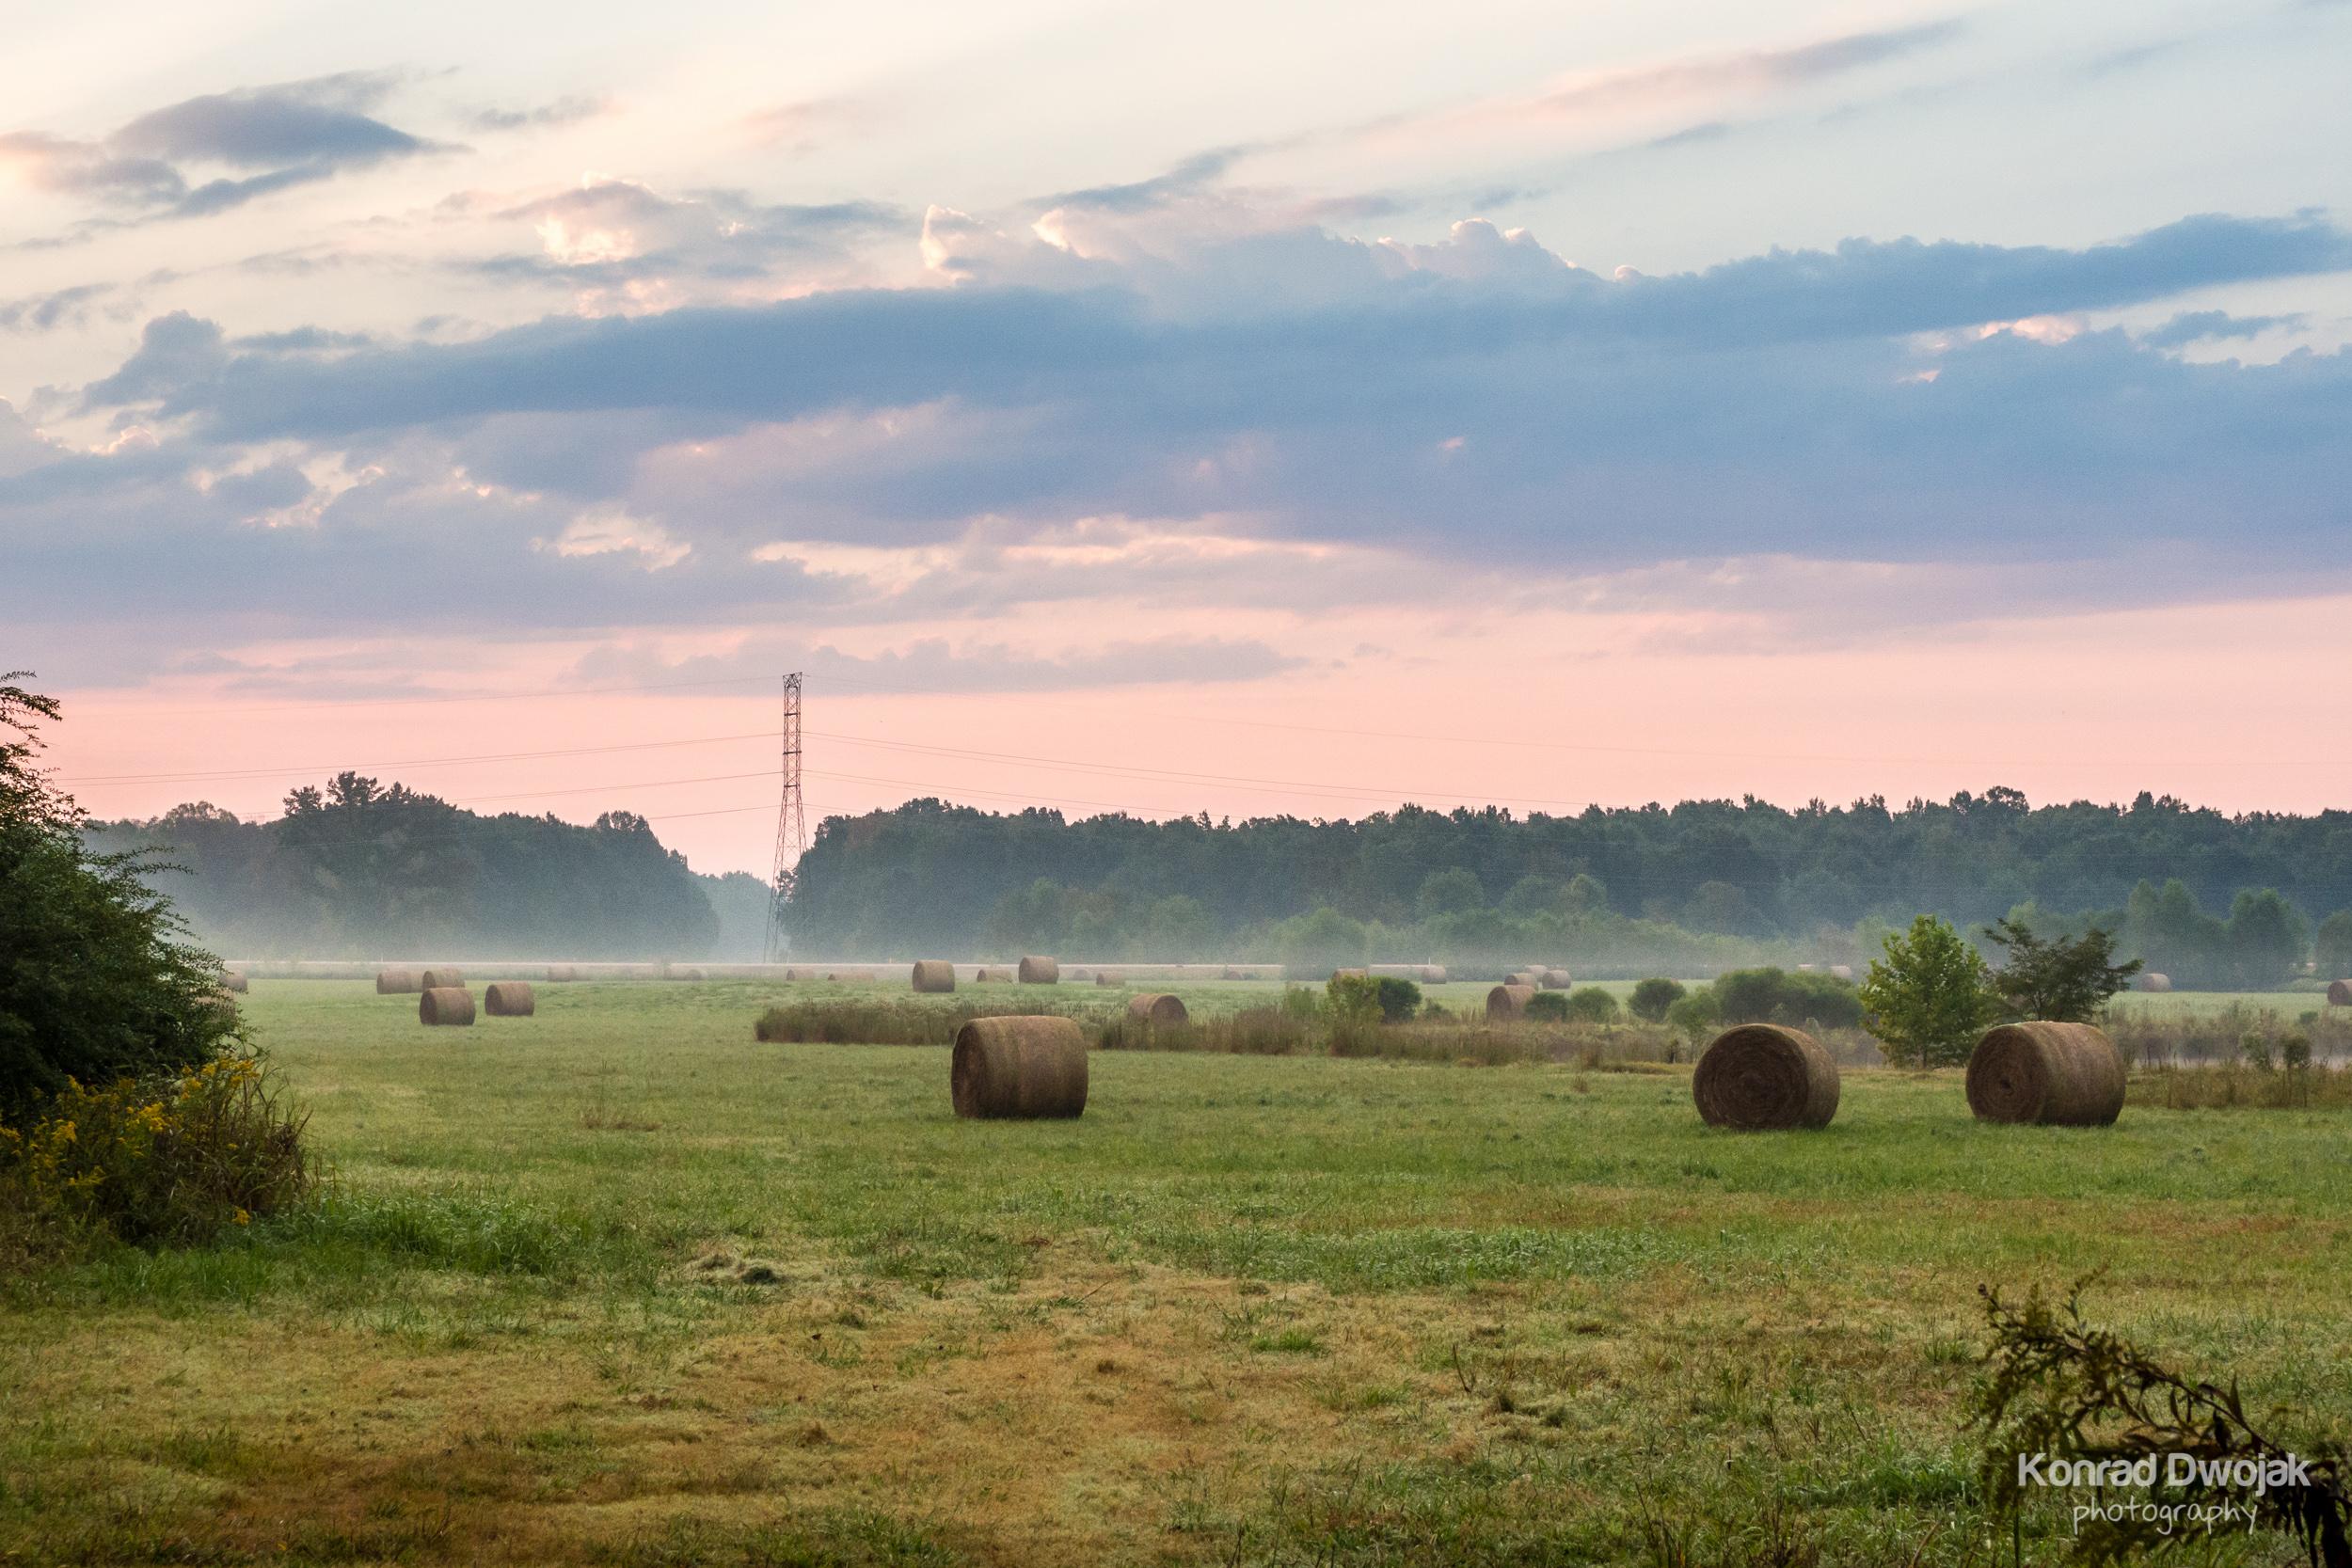 Morning jogging view